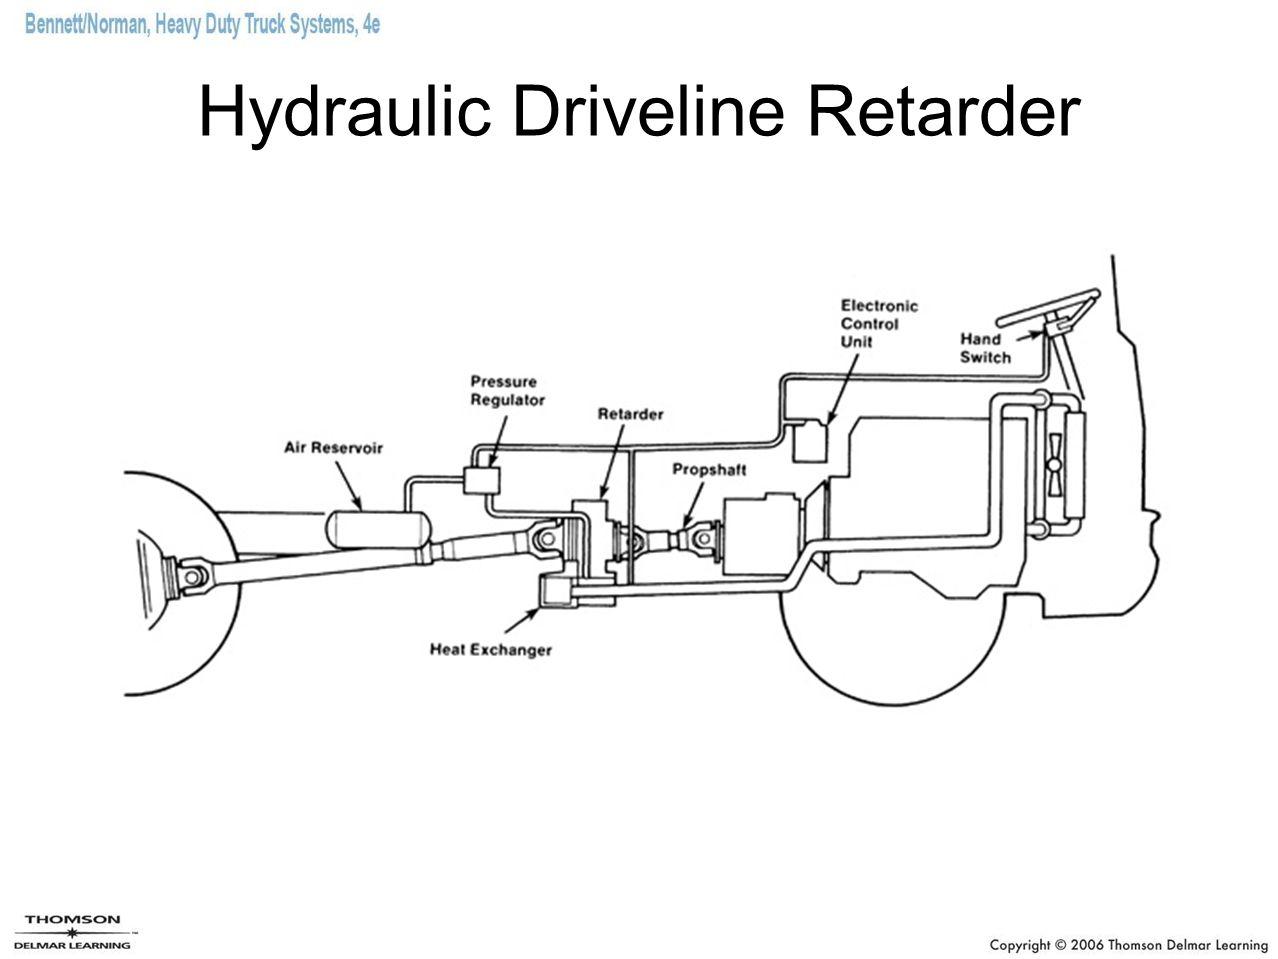 Hydraulic Driveline Retarder